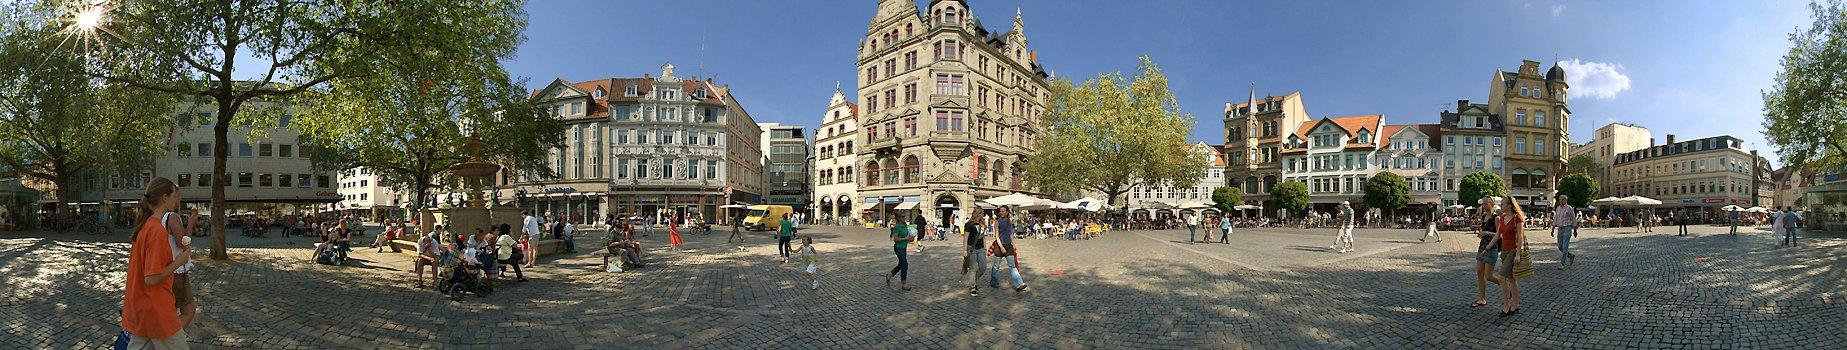 Singlebörse ravensburg picture 8